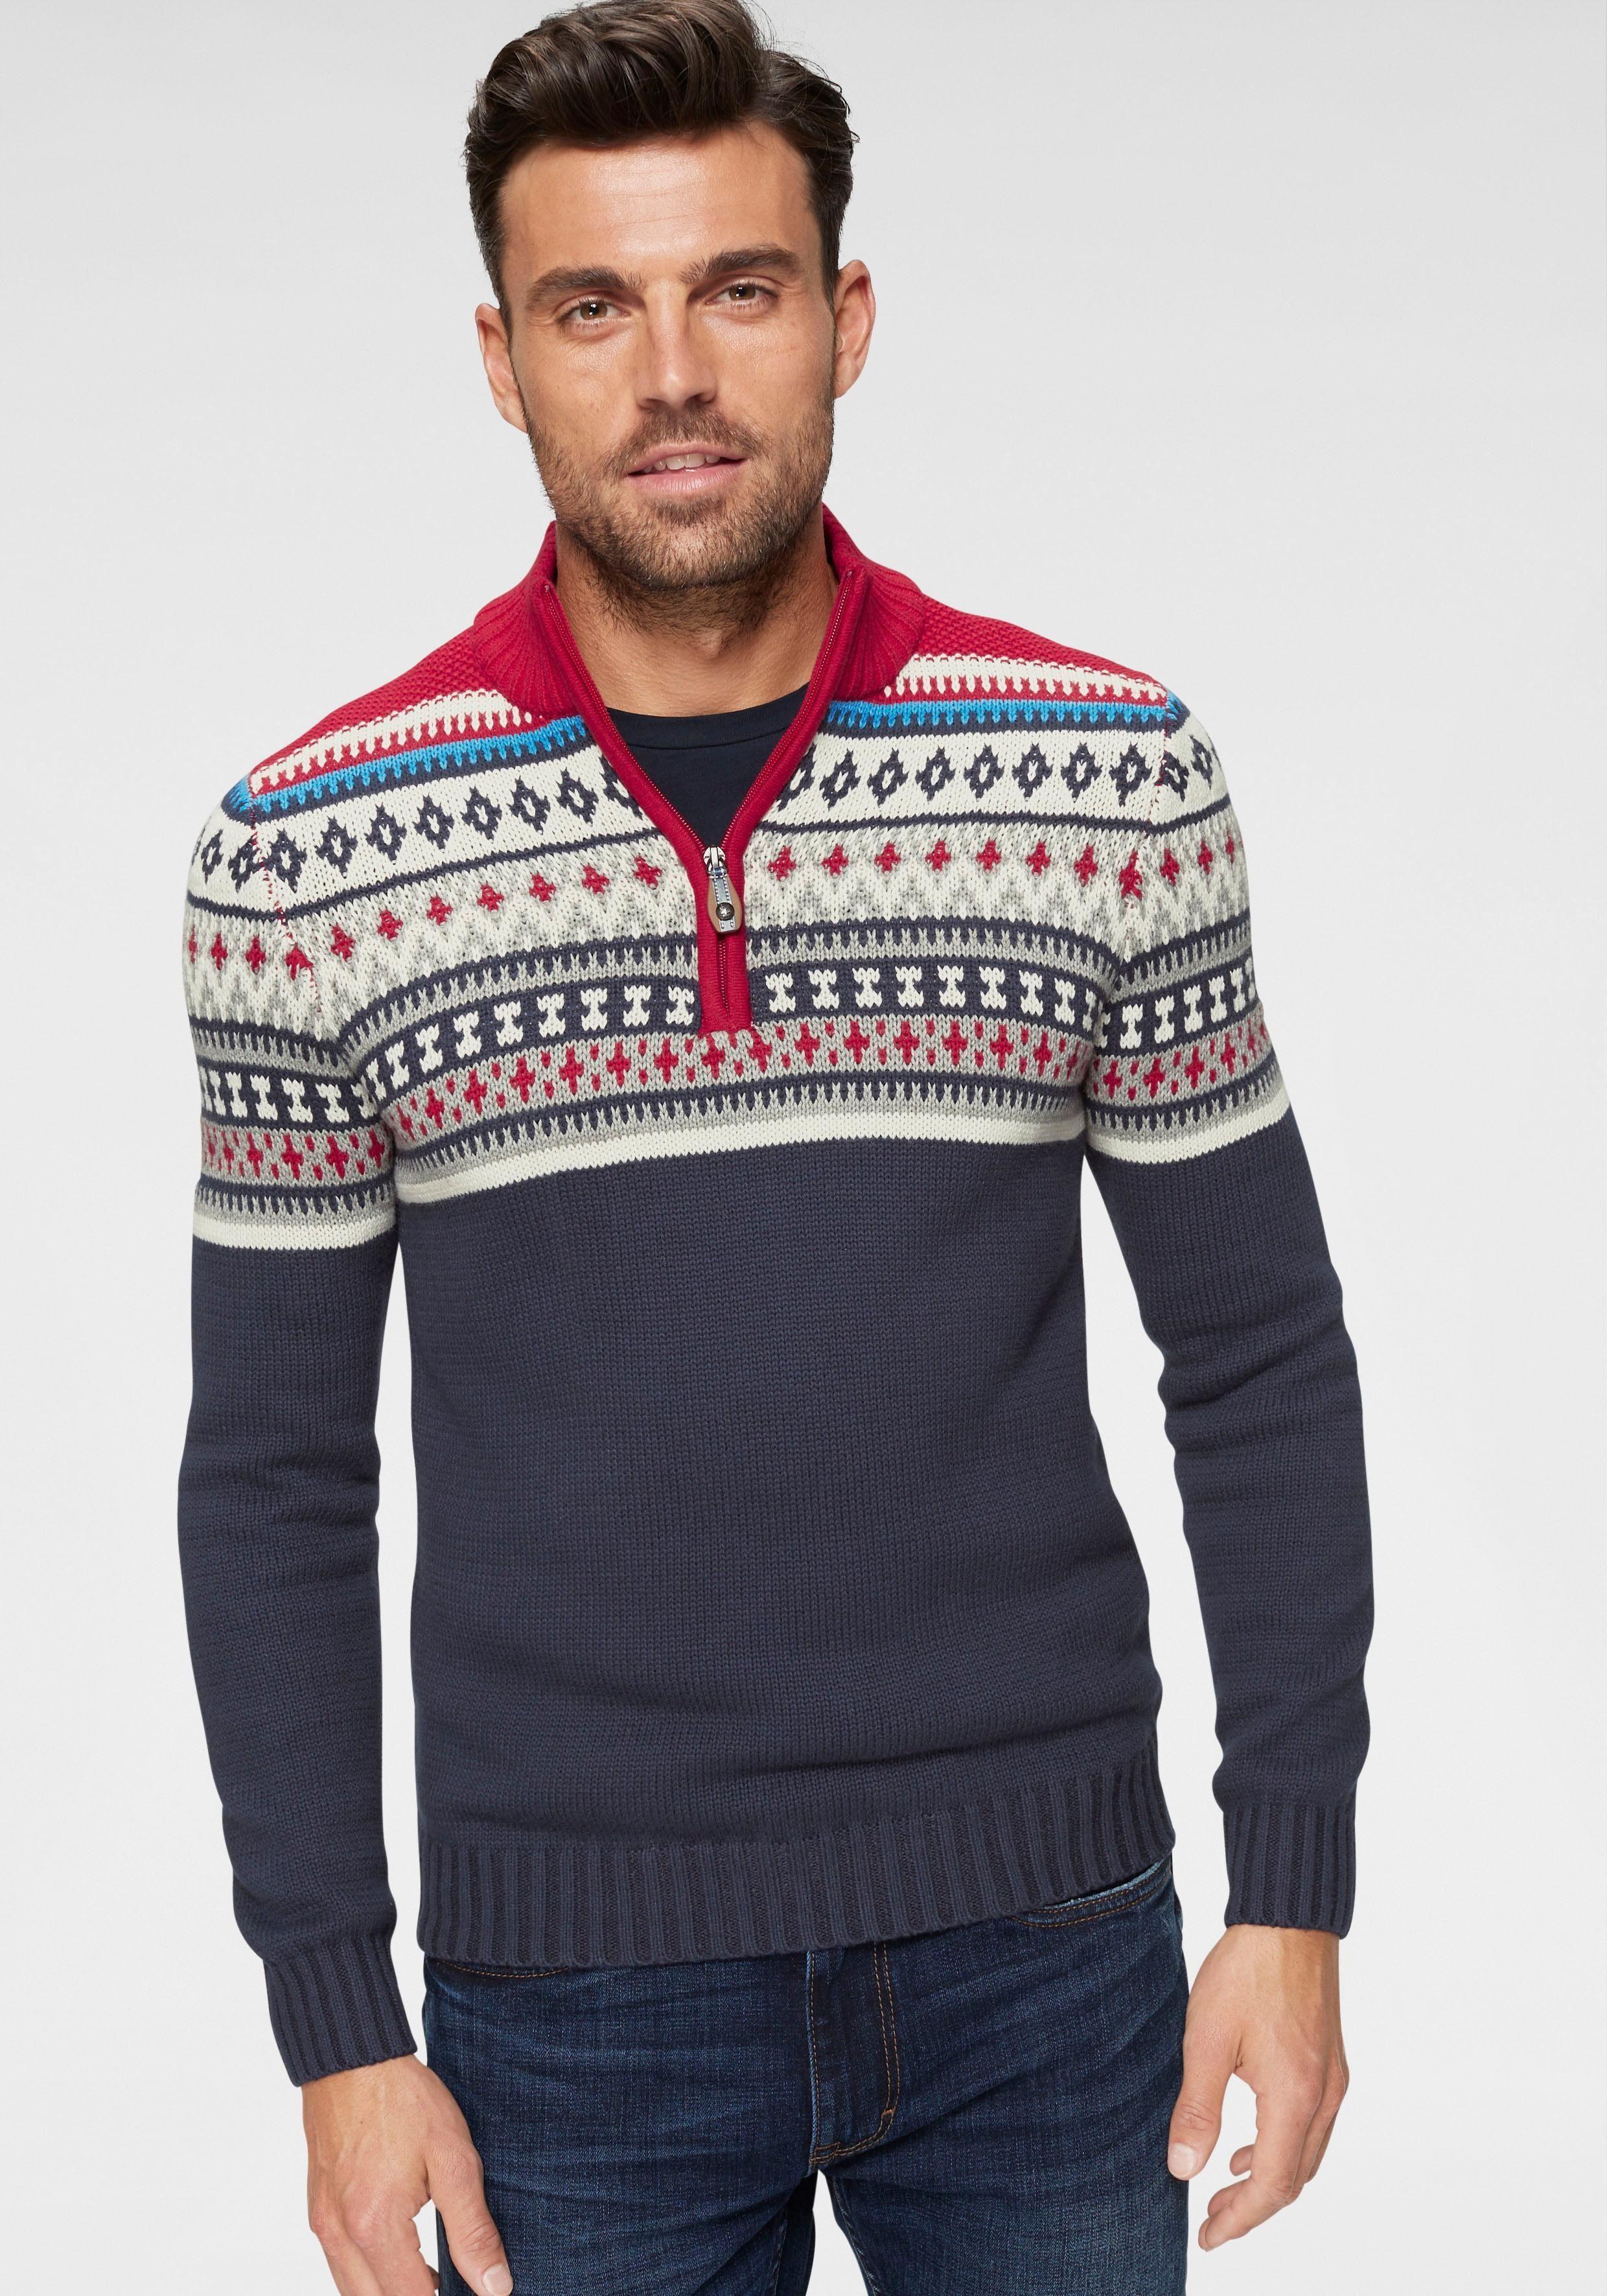 IZOD Norwegerpullover | Bekleidung > Pullover > Norwegerpullover | Blau | Izod